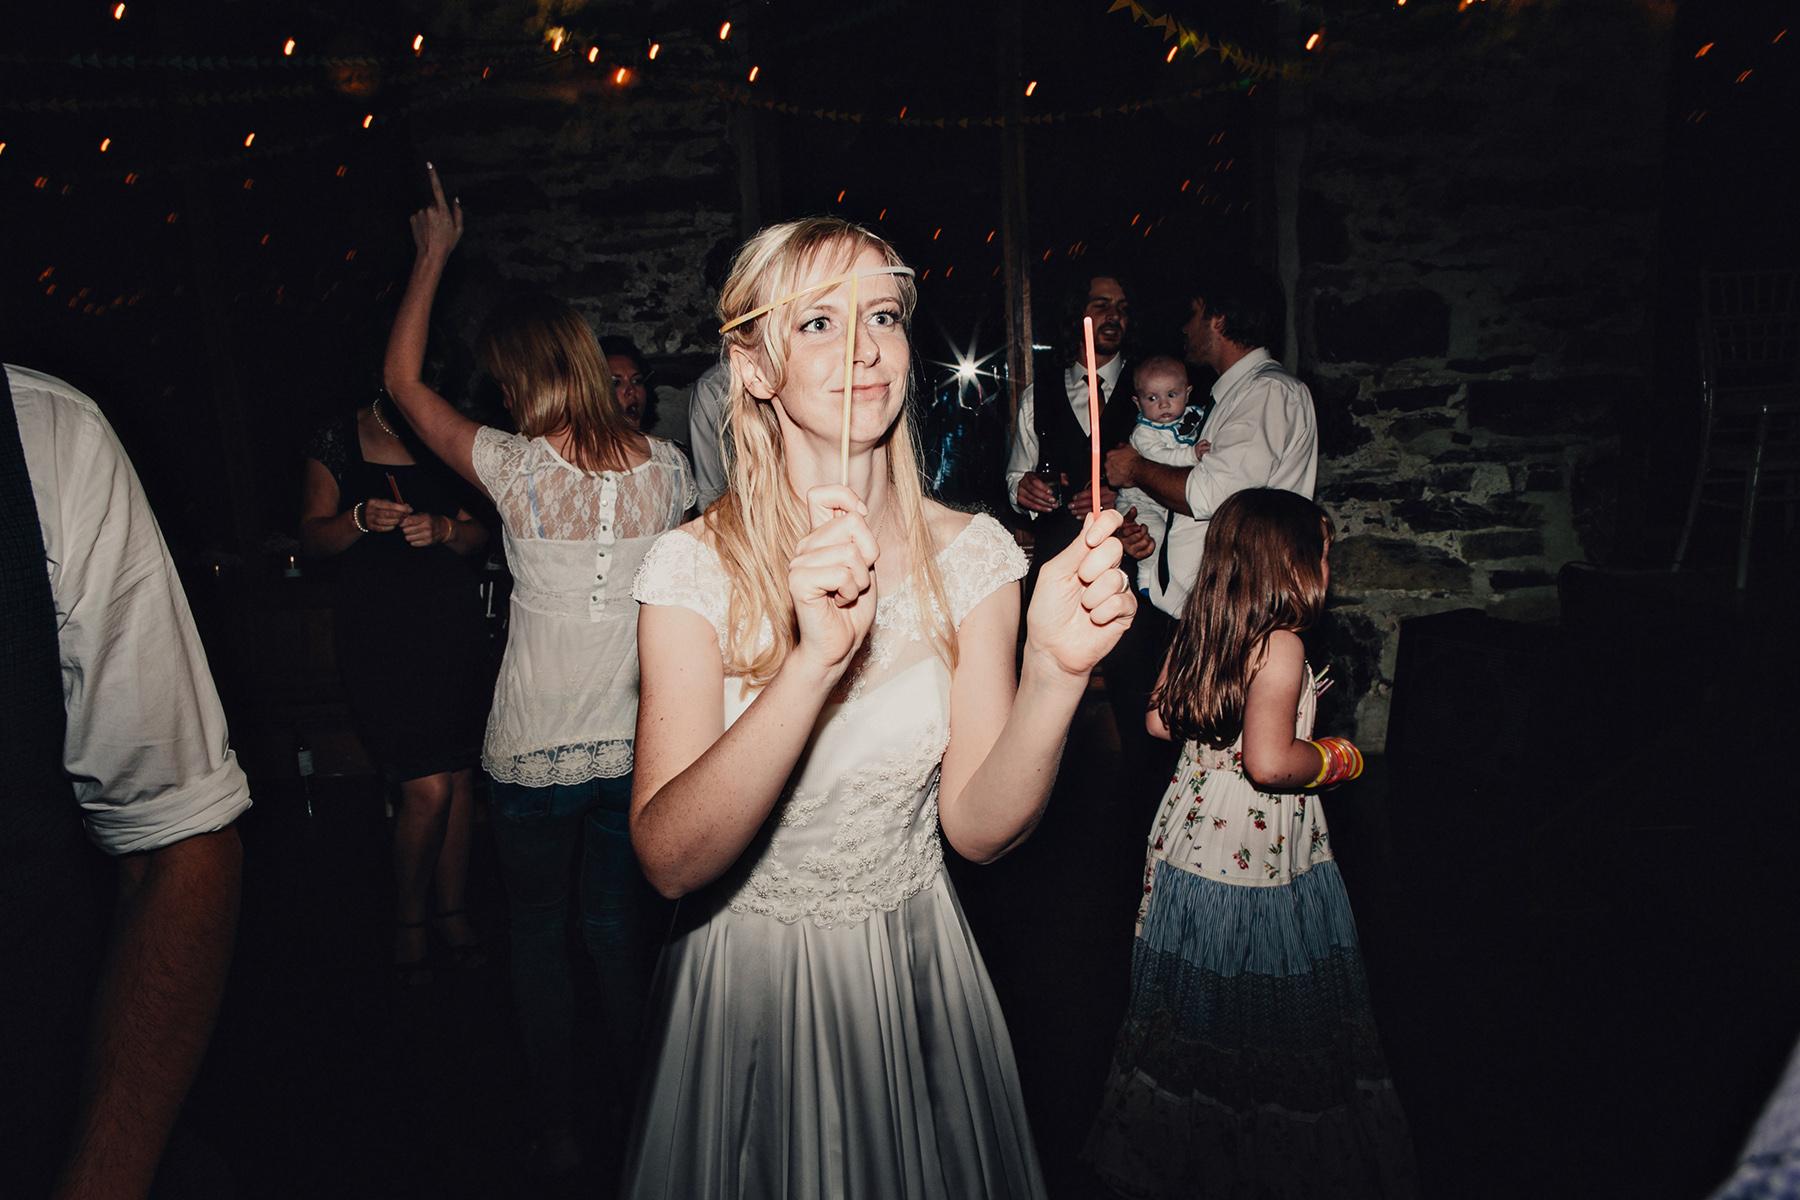 Snowdonia-Wales-Wedding-Photos-0416.jpg